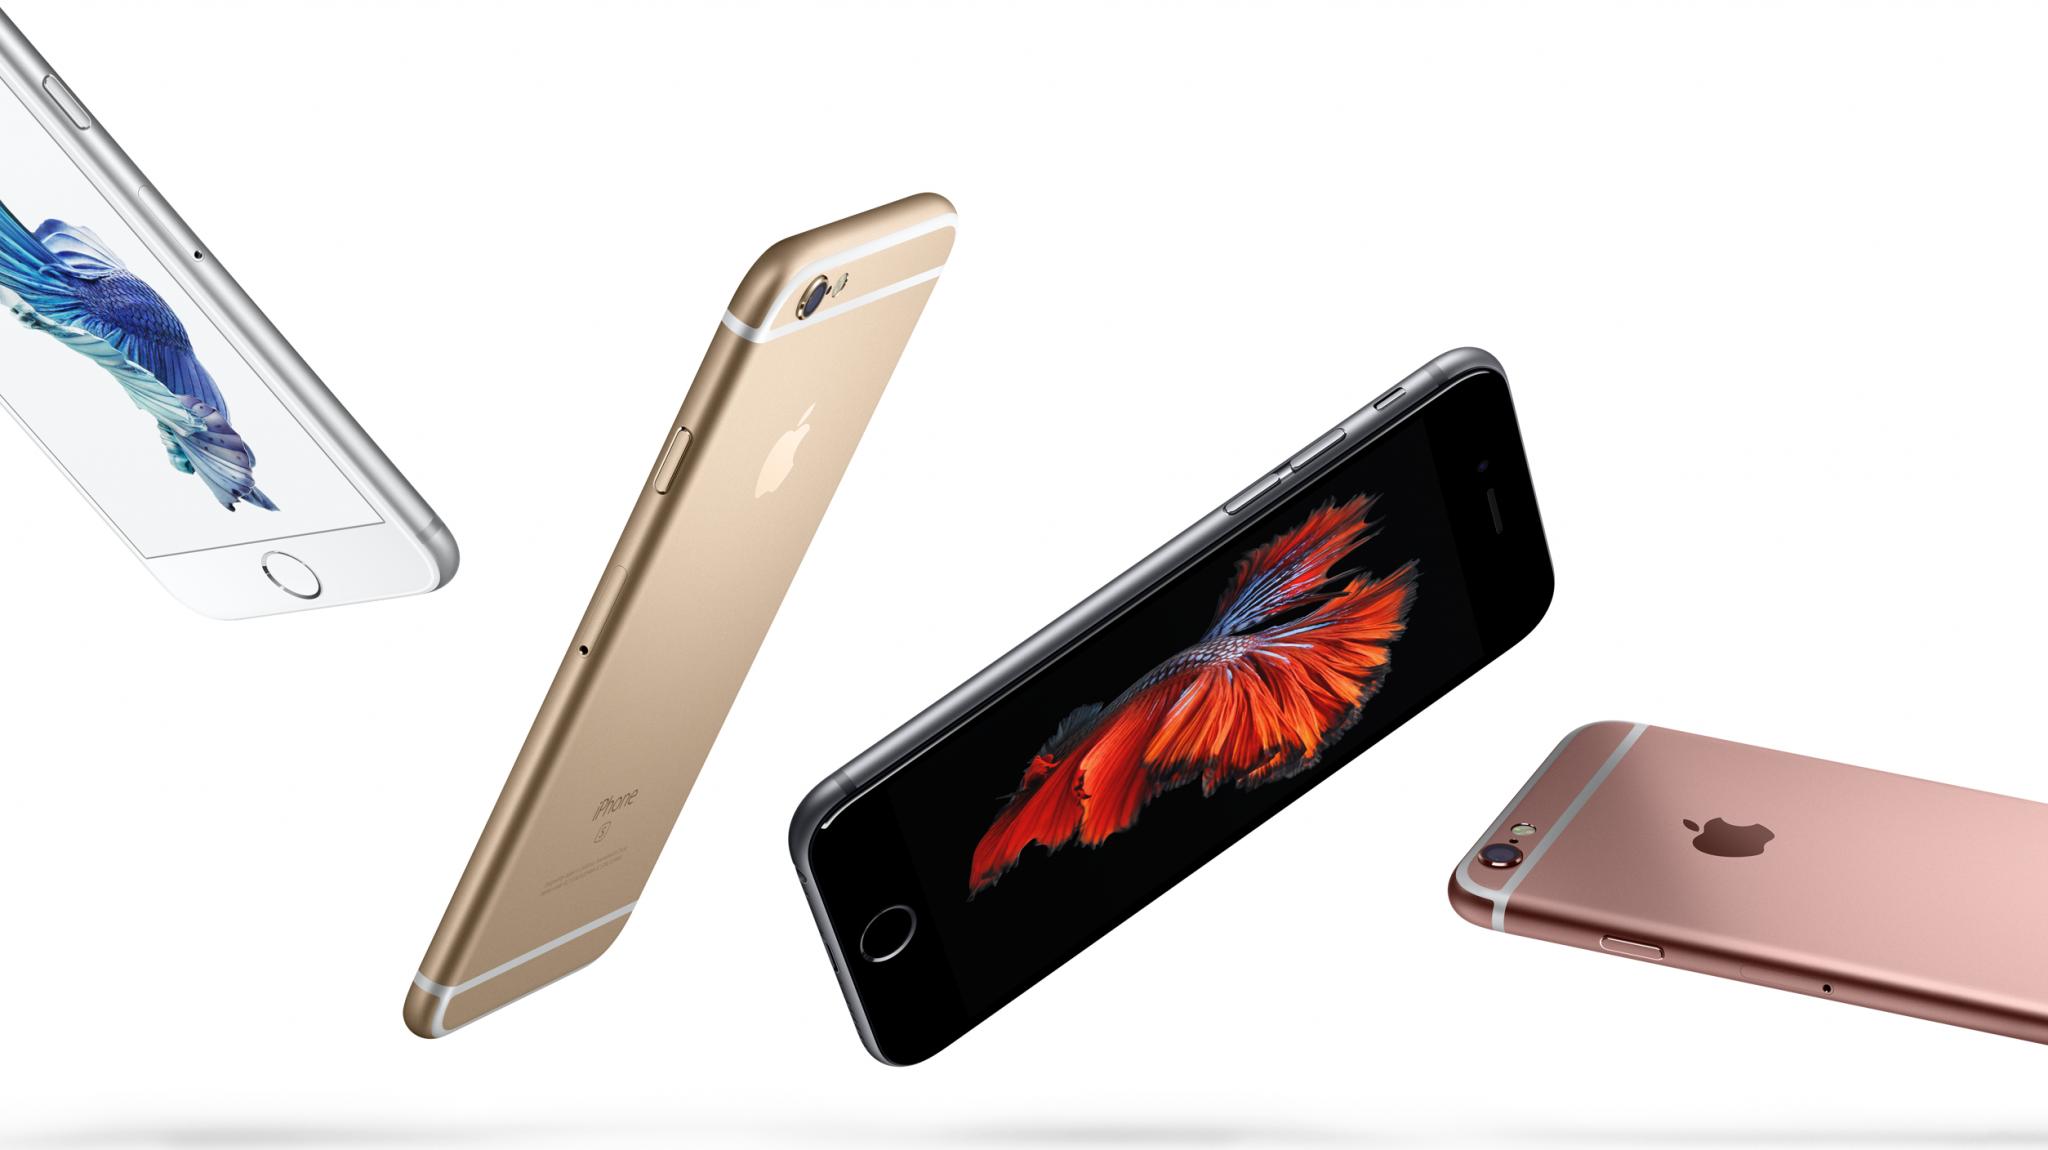 iPhone 6s上台出機 攻略「分析篇」